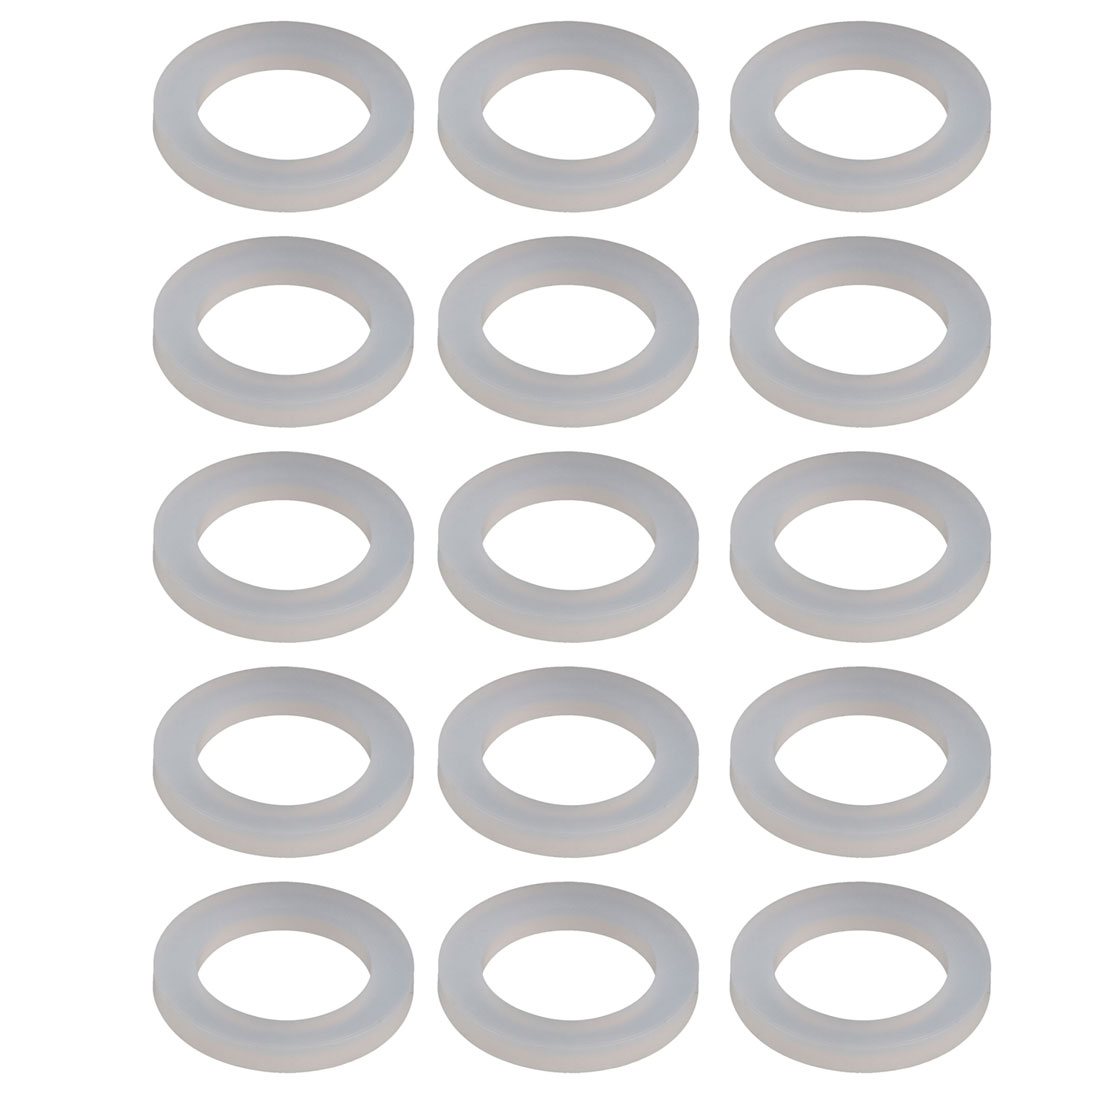 15pcs White Silica Gel Round Flat Washer Assortment Size 16x24x3mm Flat Washer